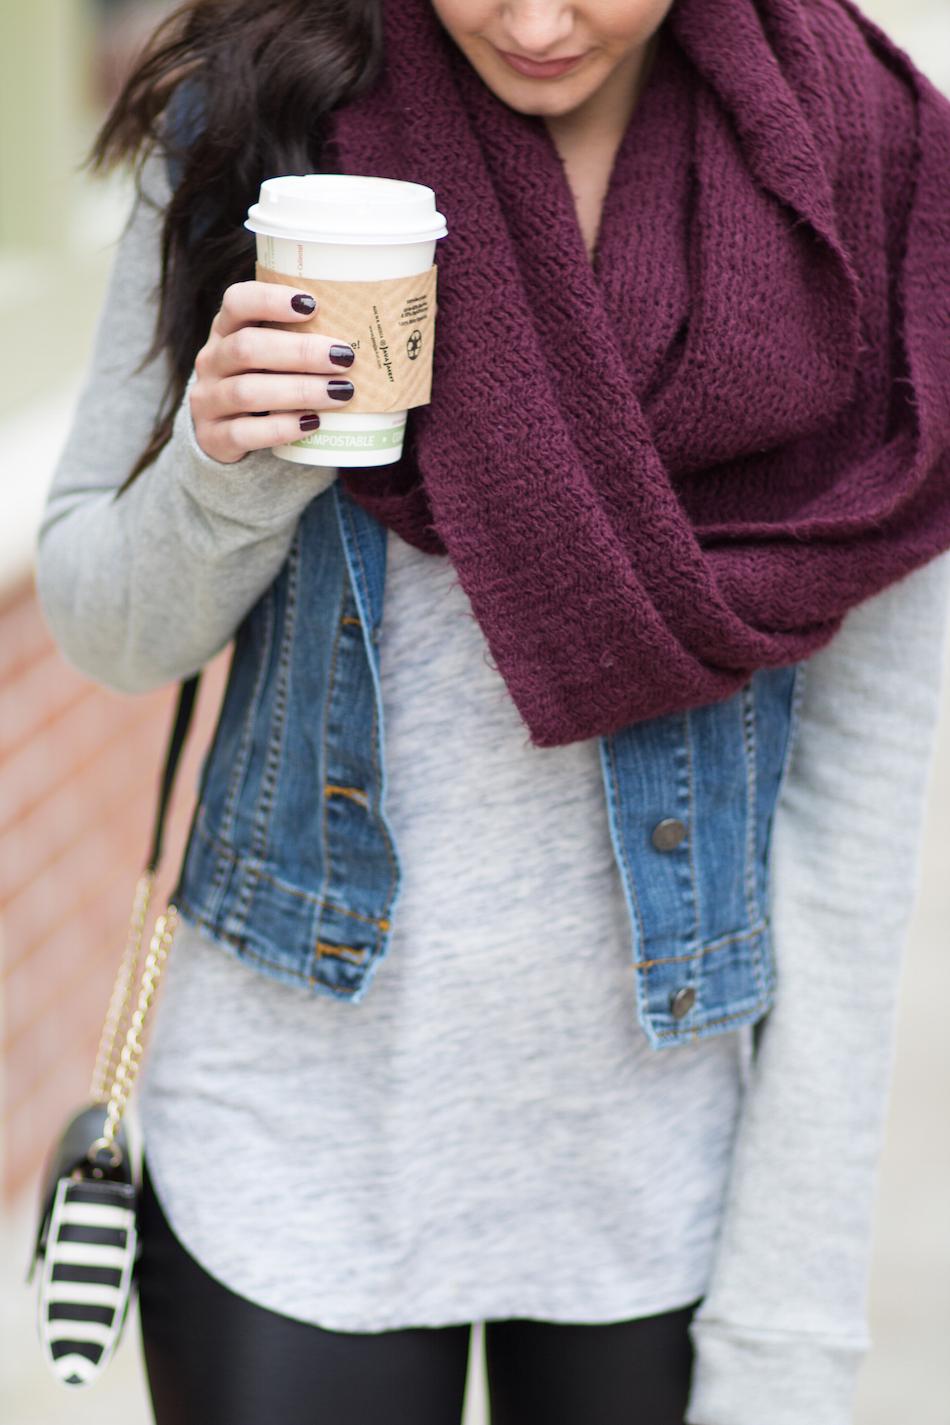 cozy layers + coffee